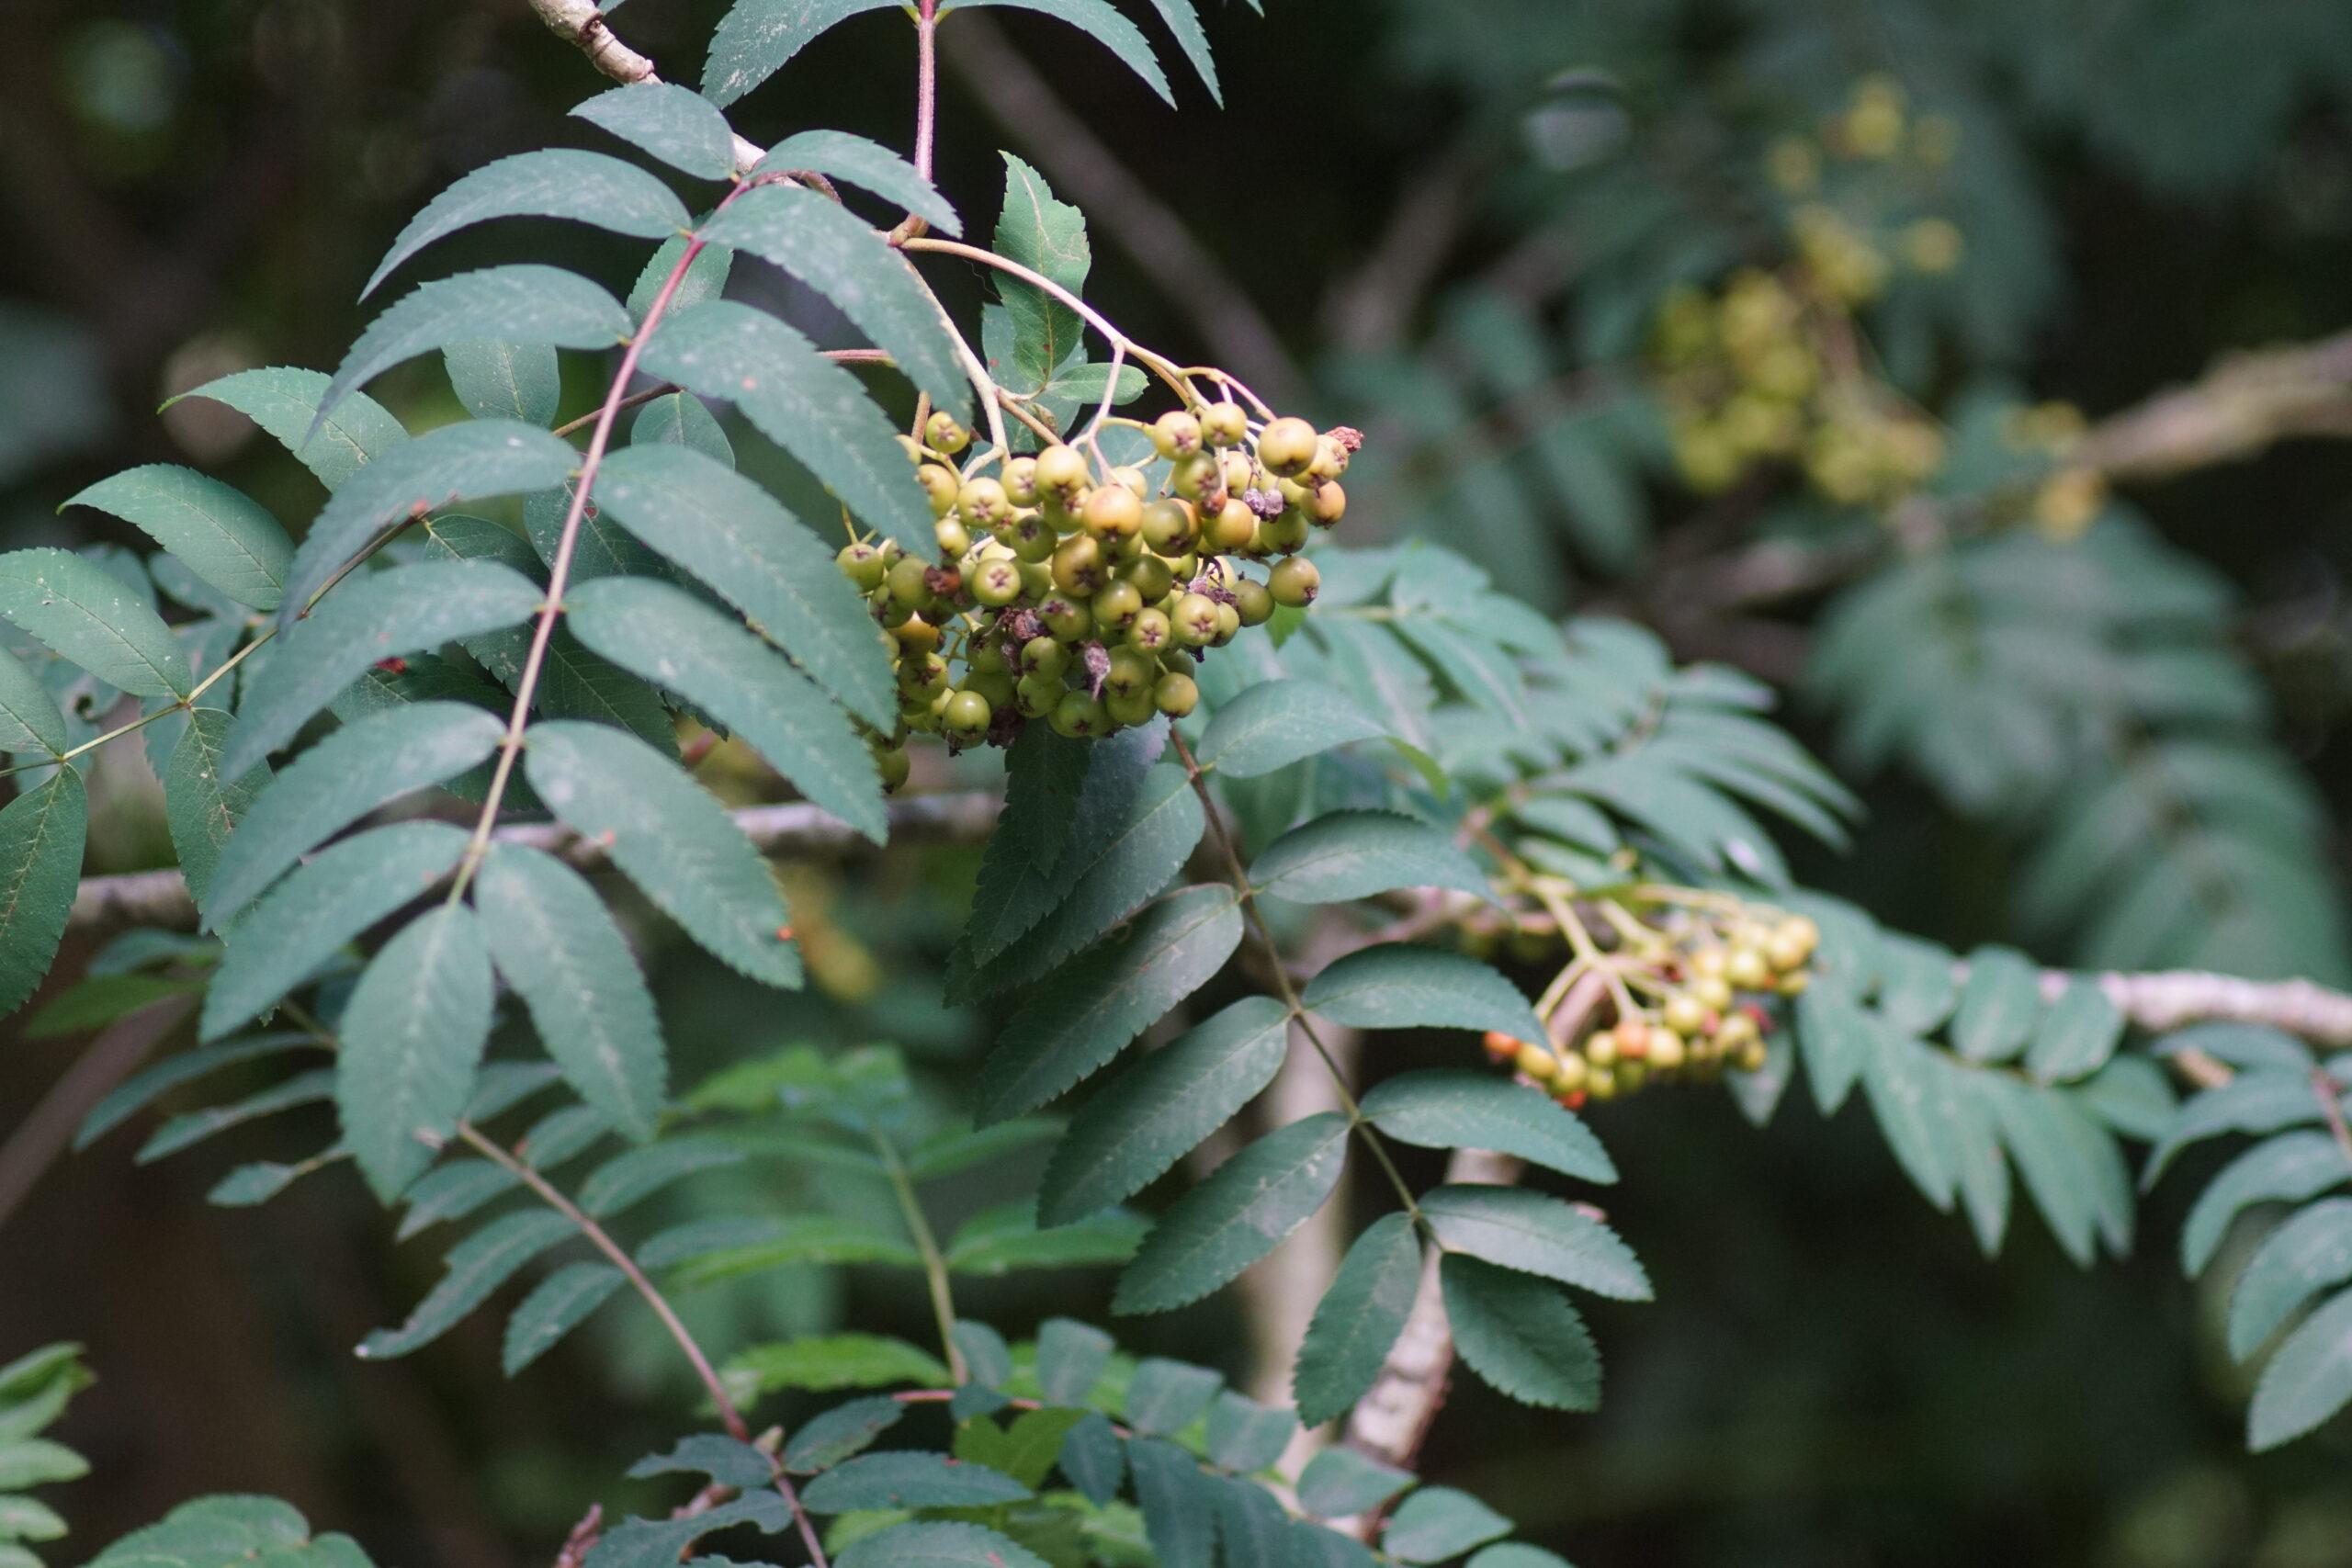 Berries developing on the Rowan tree - June